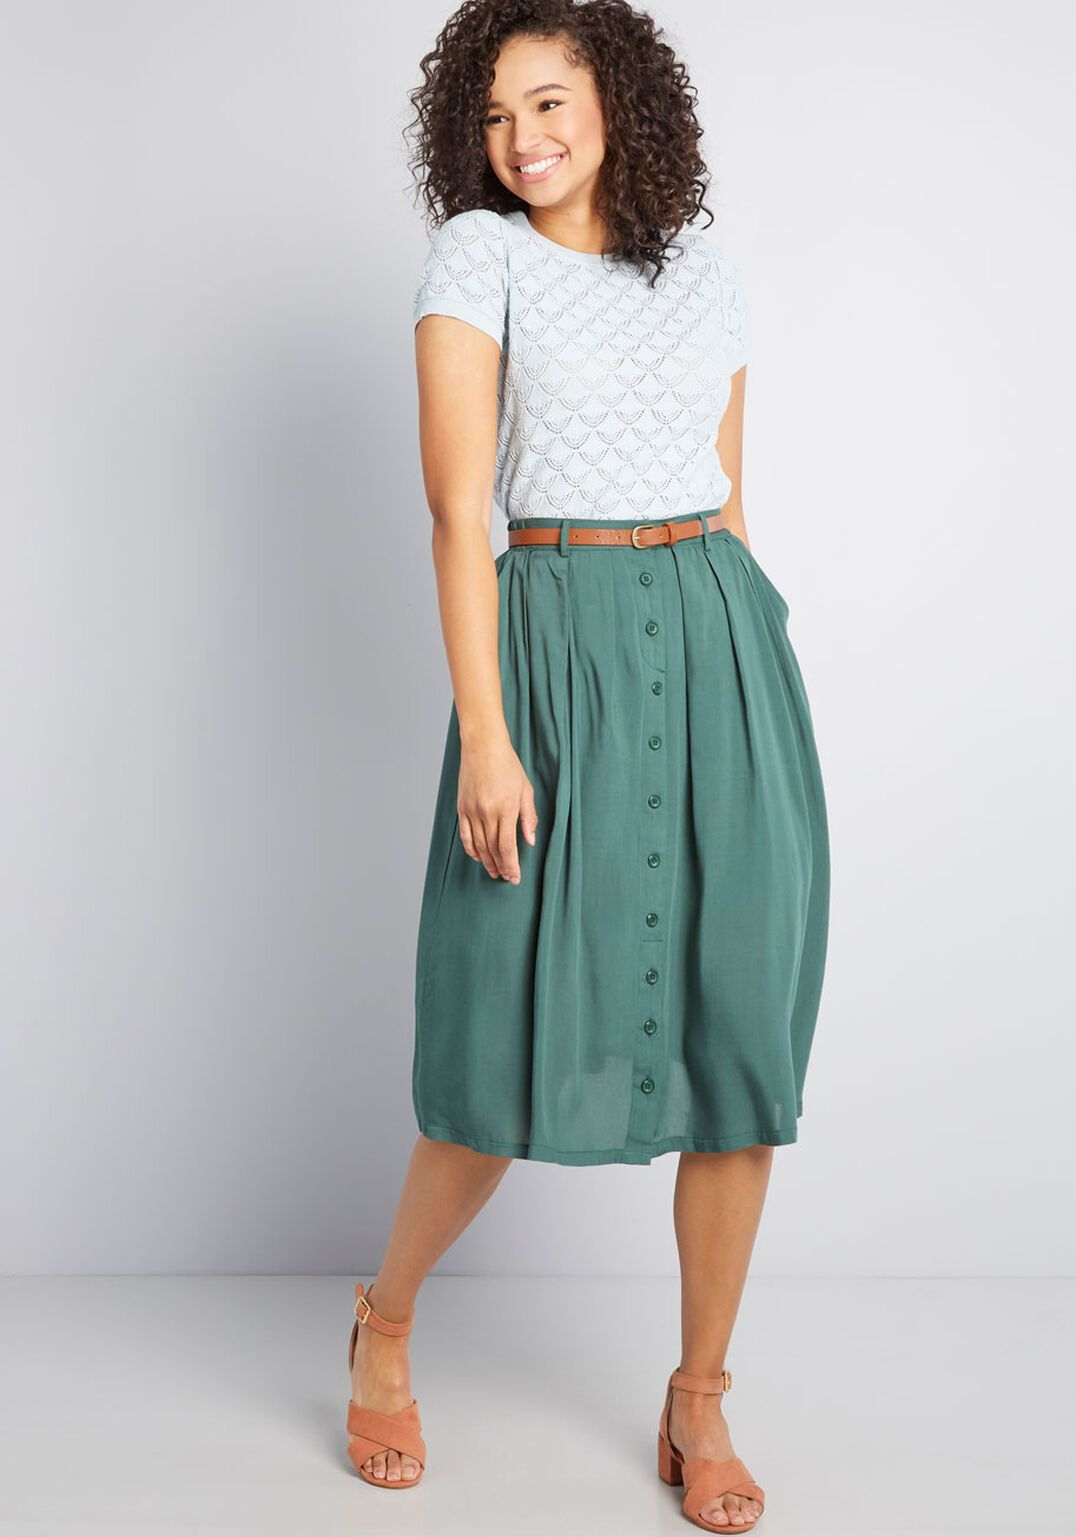 2fce70f70 Bookstore's Best Midi Skirt in 2019 | // SHOP | Midi skirt, Skirts ...